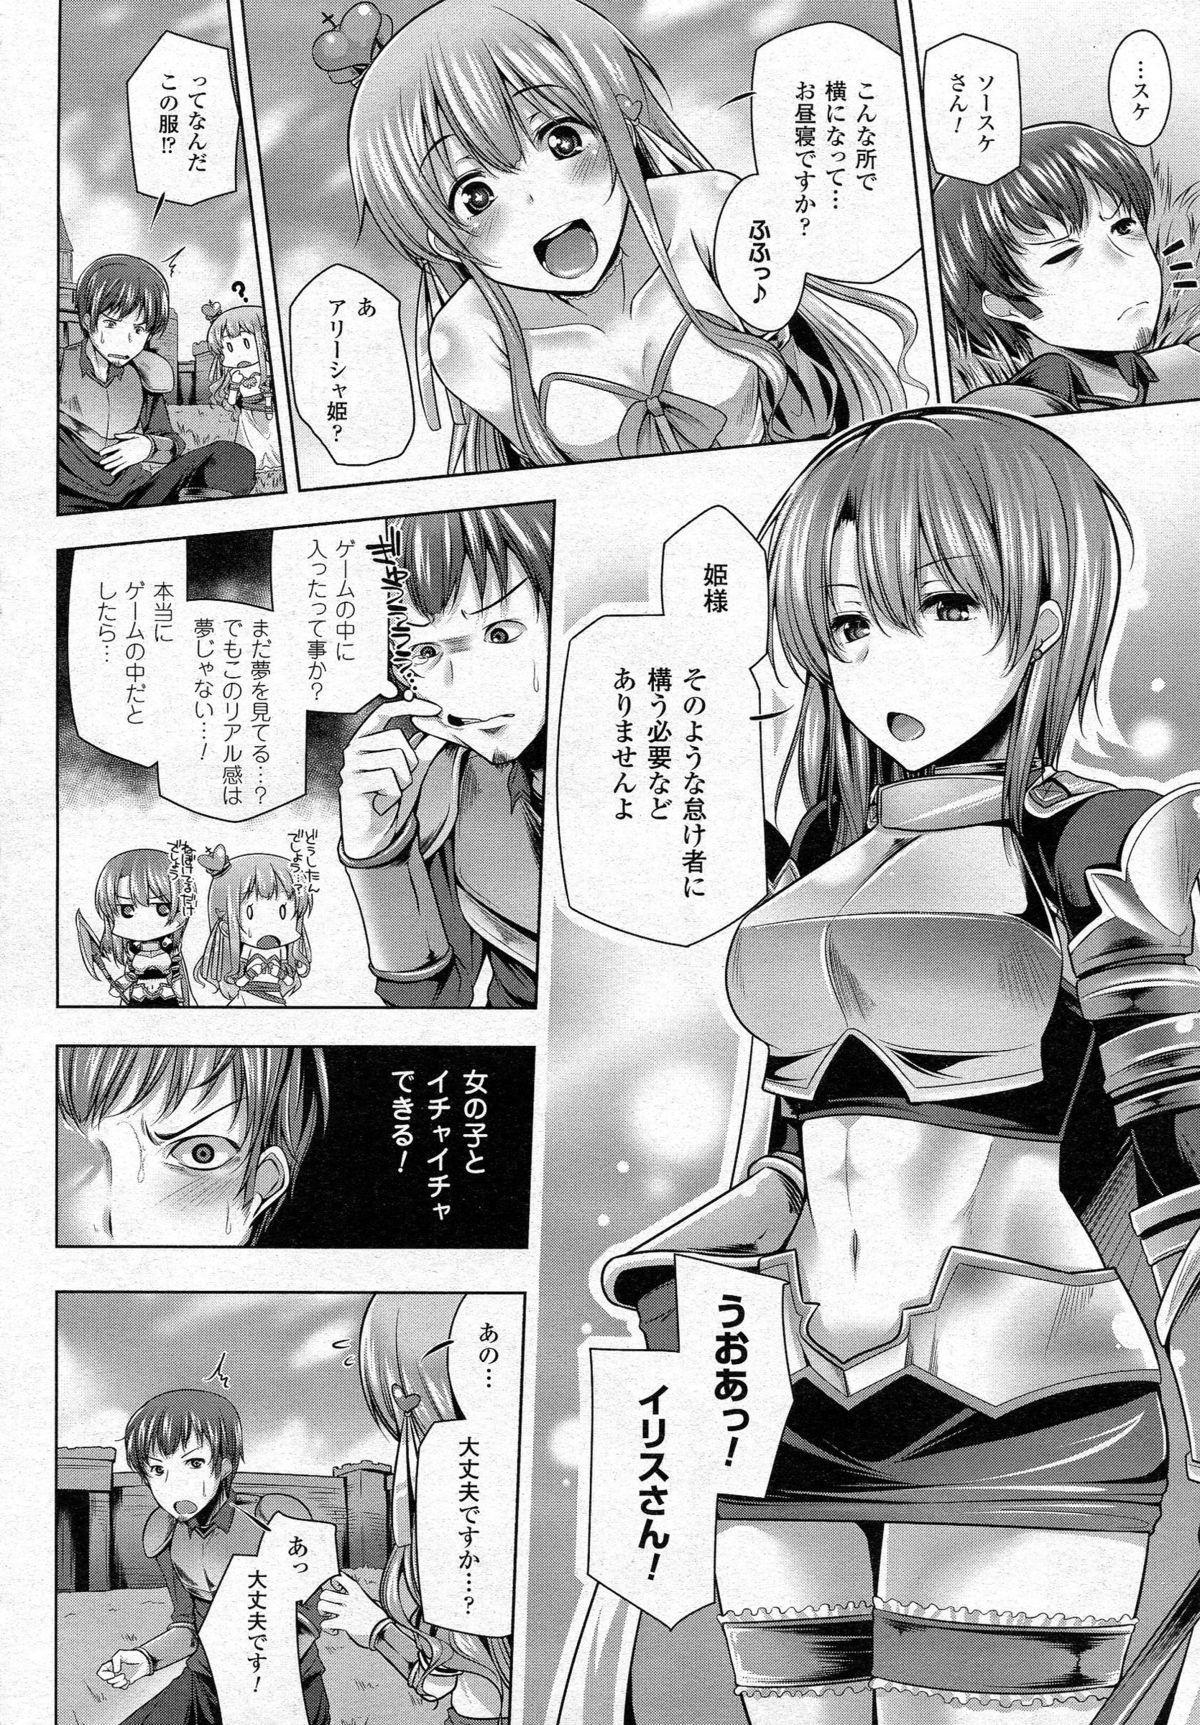 COMIC Unreal 2015-06 Vol. 55 + Hisasi Illust Shuu 305